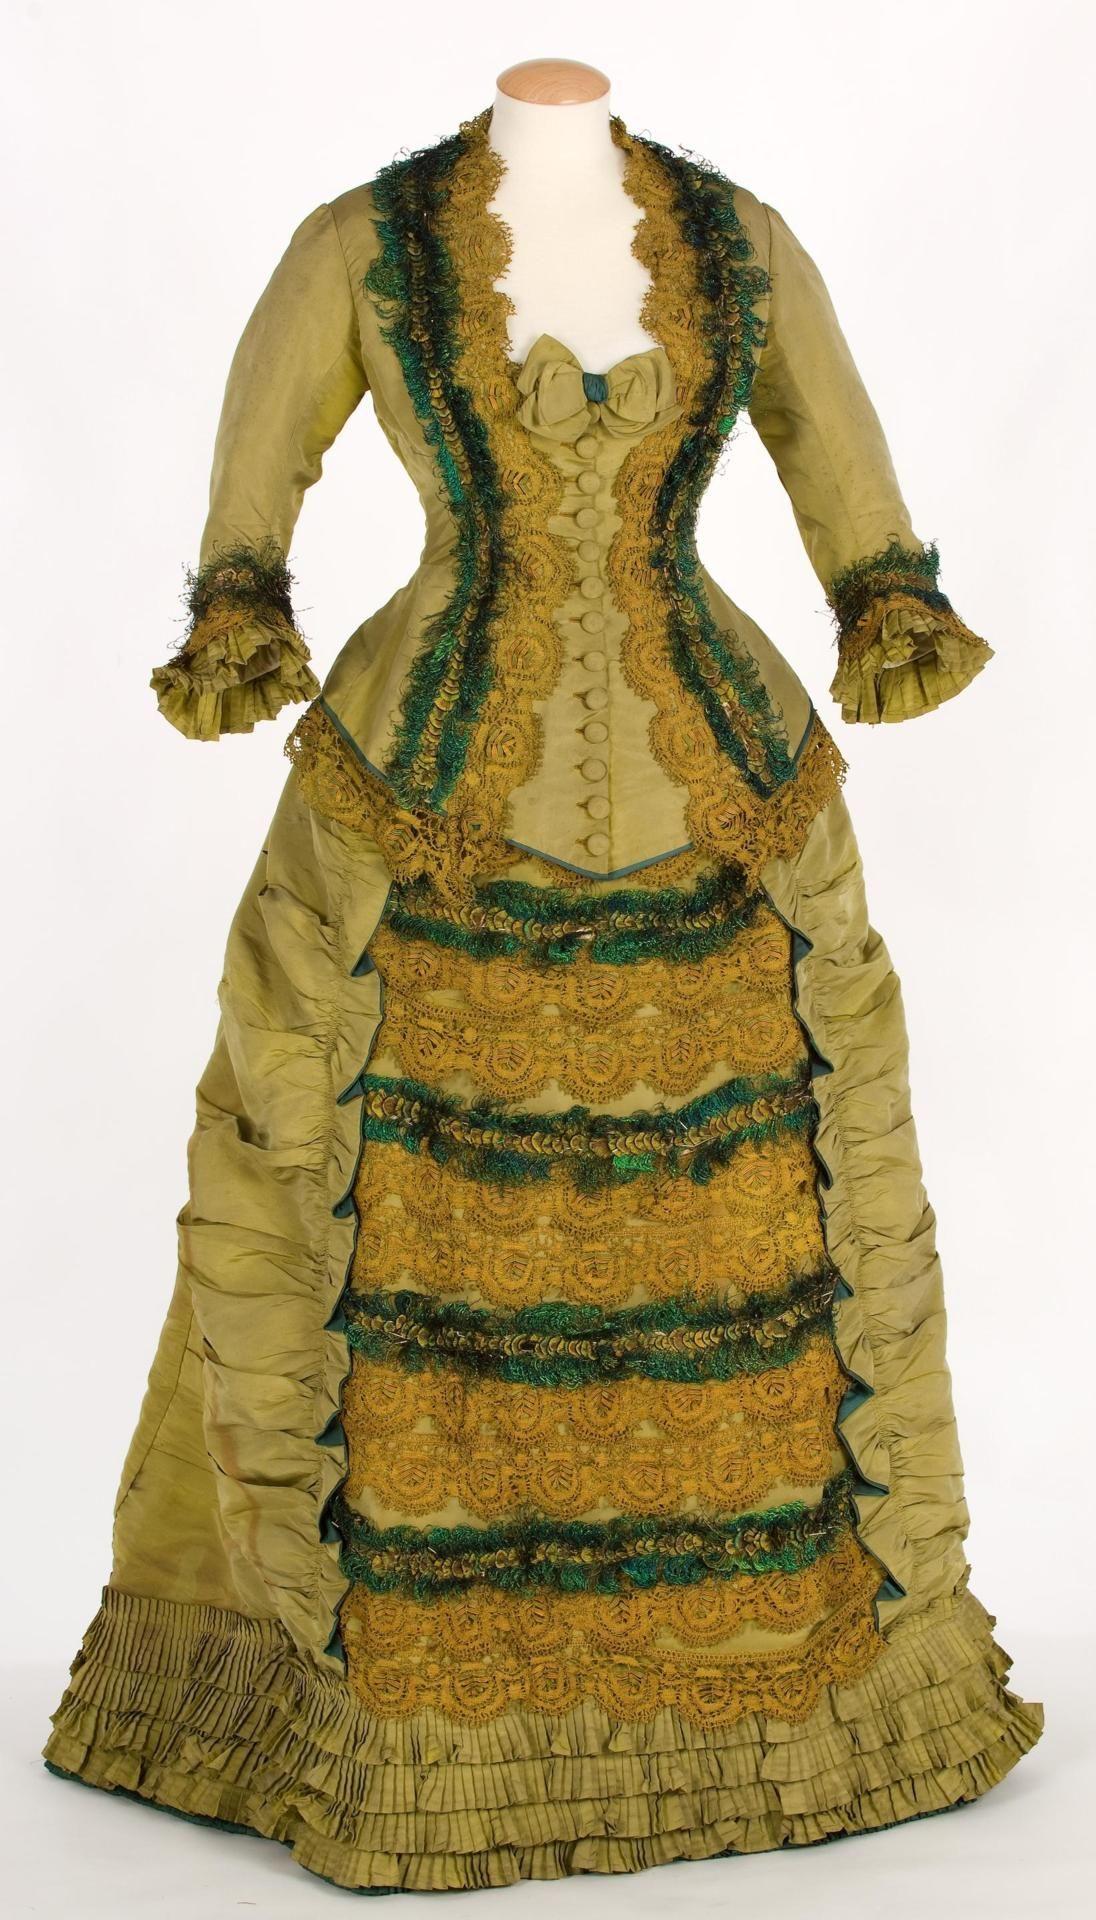 dress from imatex natural form ca 1877 1885 pinterest kleider und kleidung. Black Bedroom Furniture Sets. Home Design Ideas